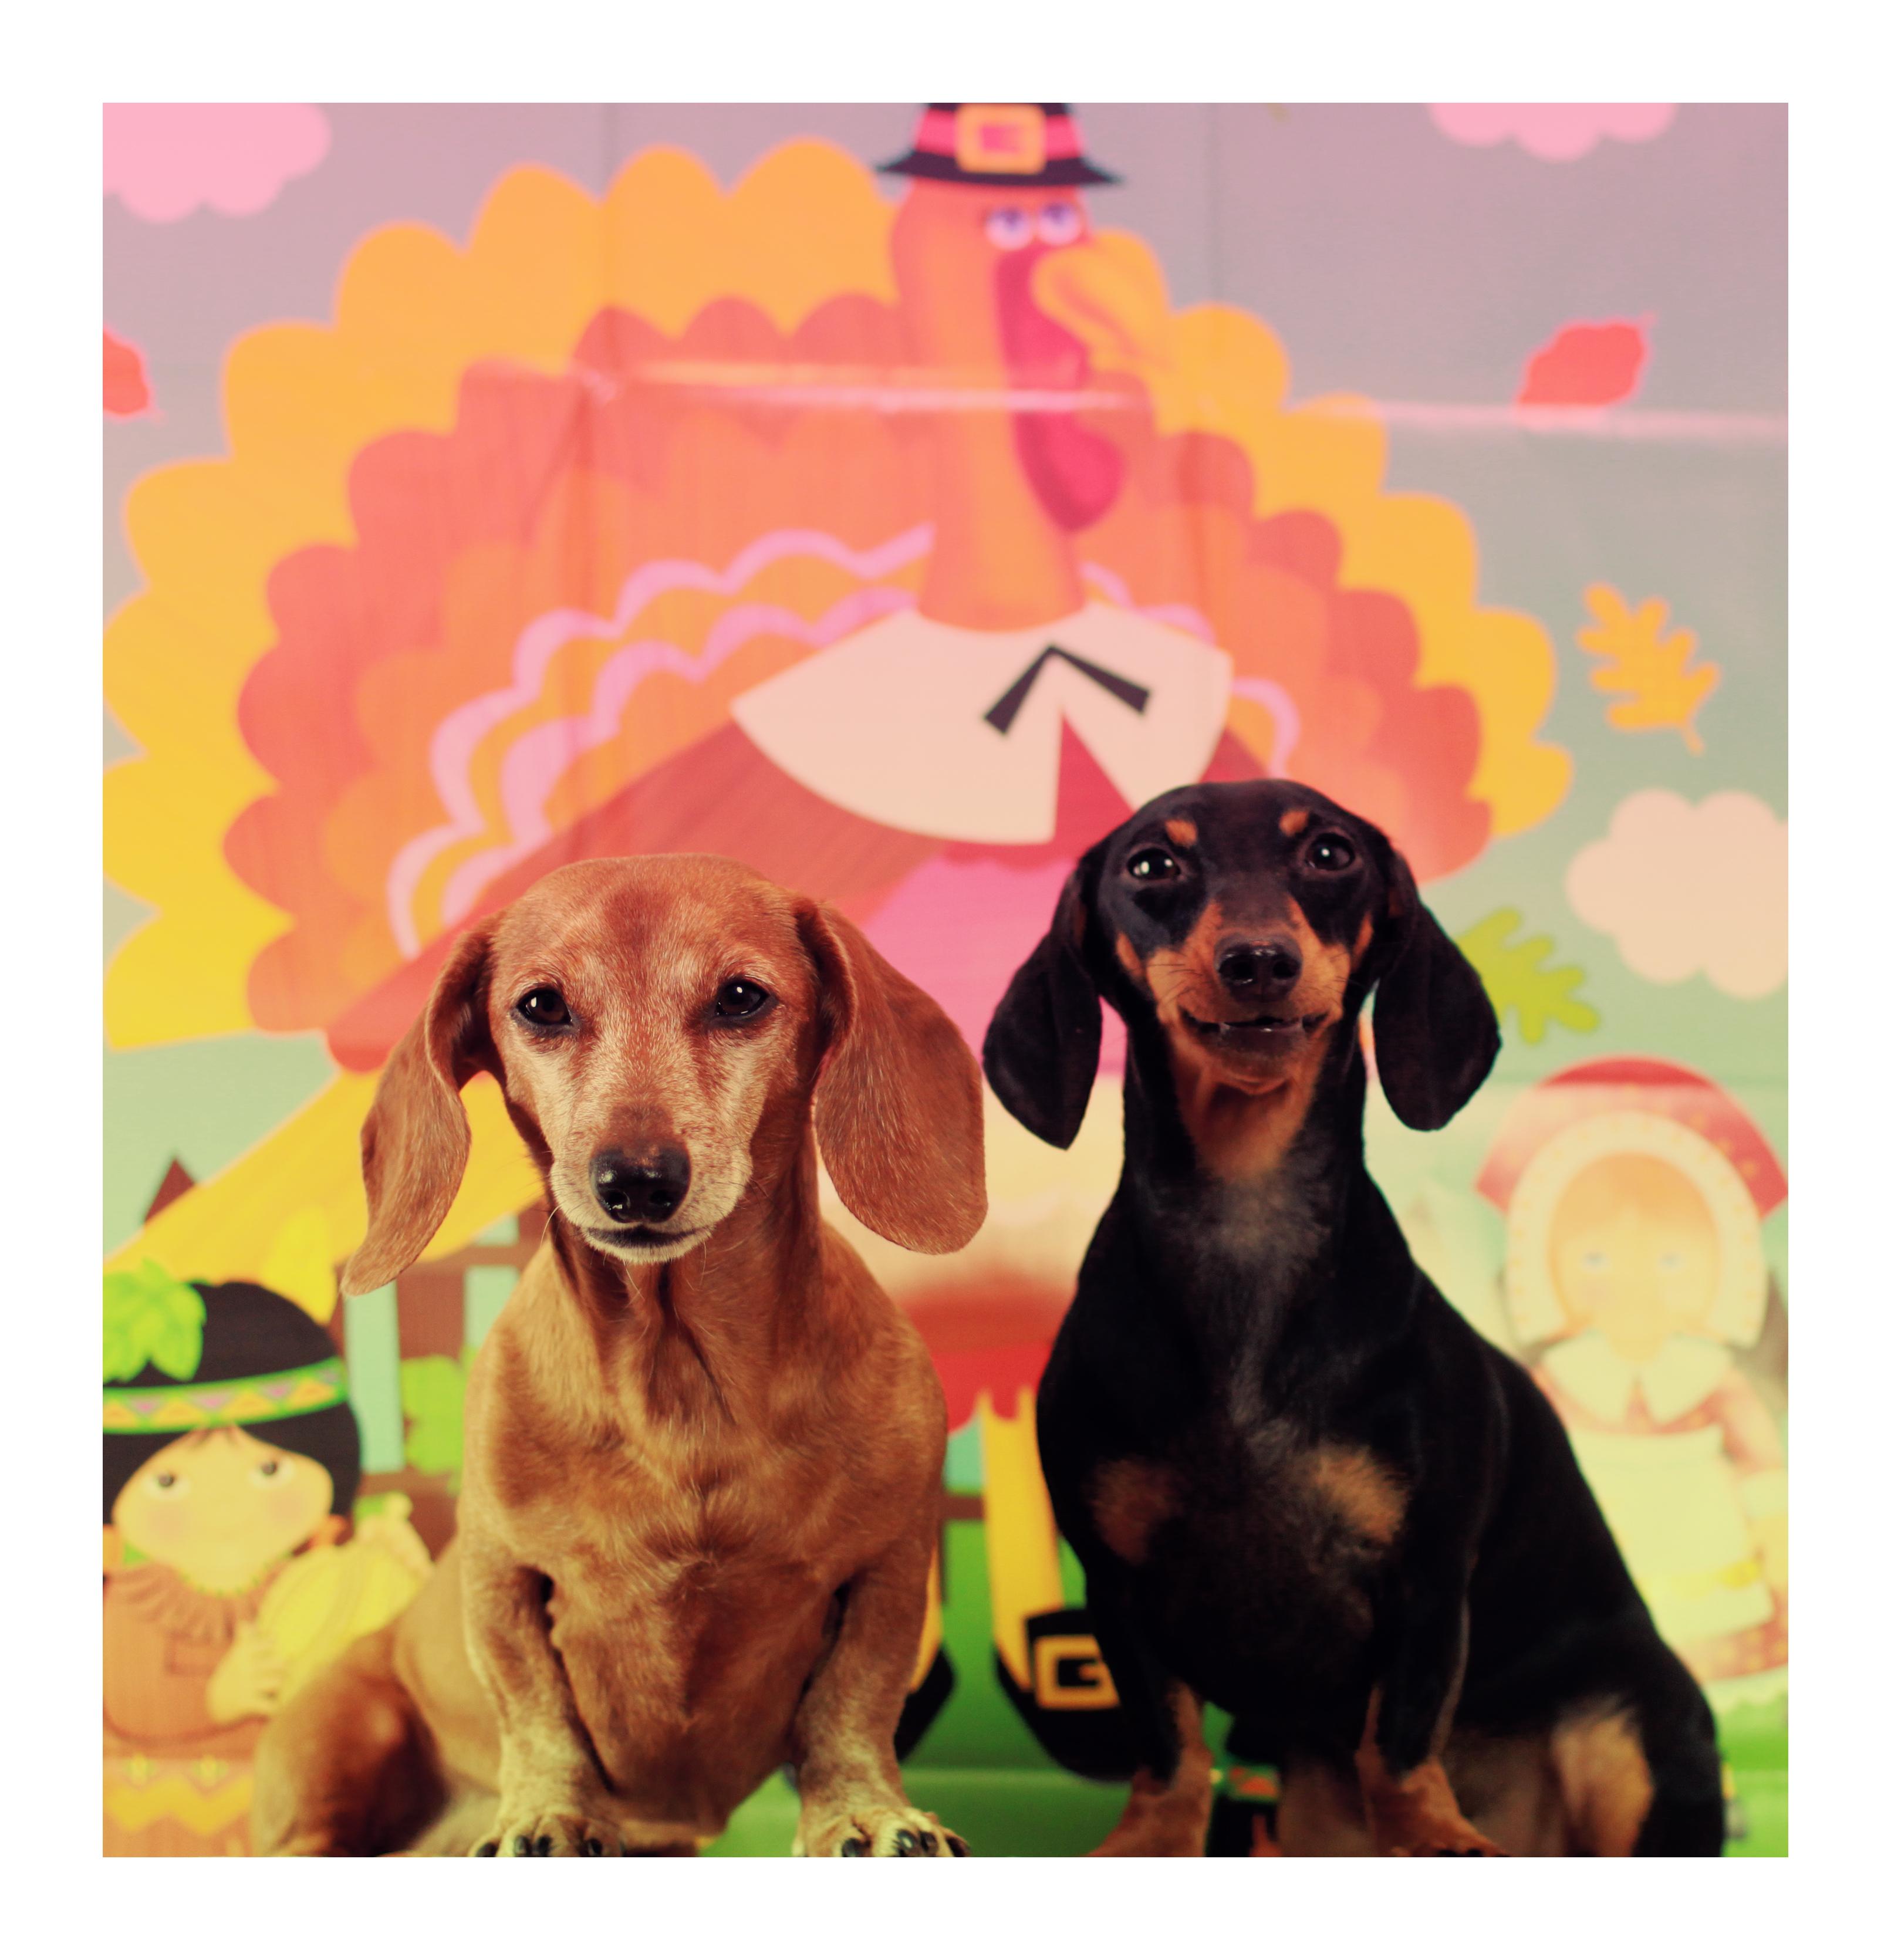 Fall Wallpaper Dog Weenie Happy Thanksgiving Rufusontheweb